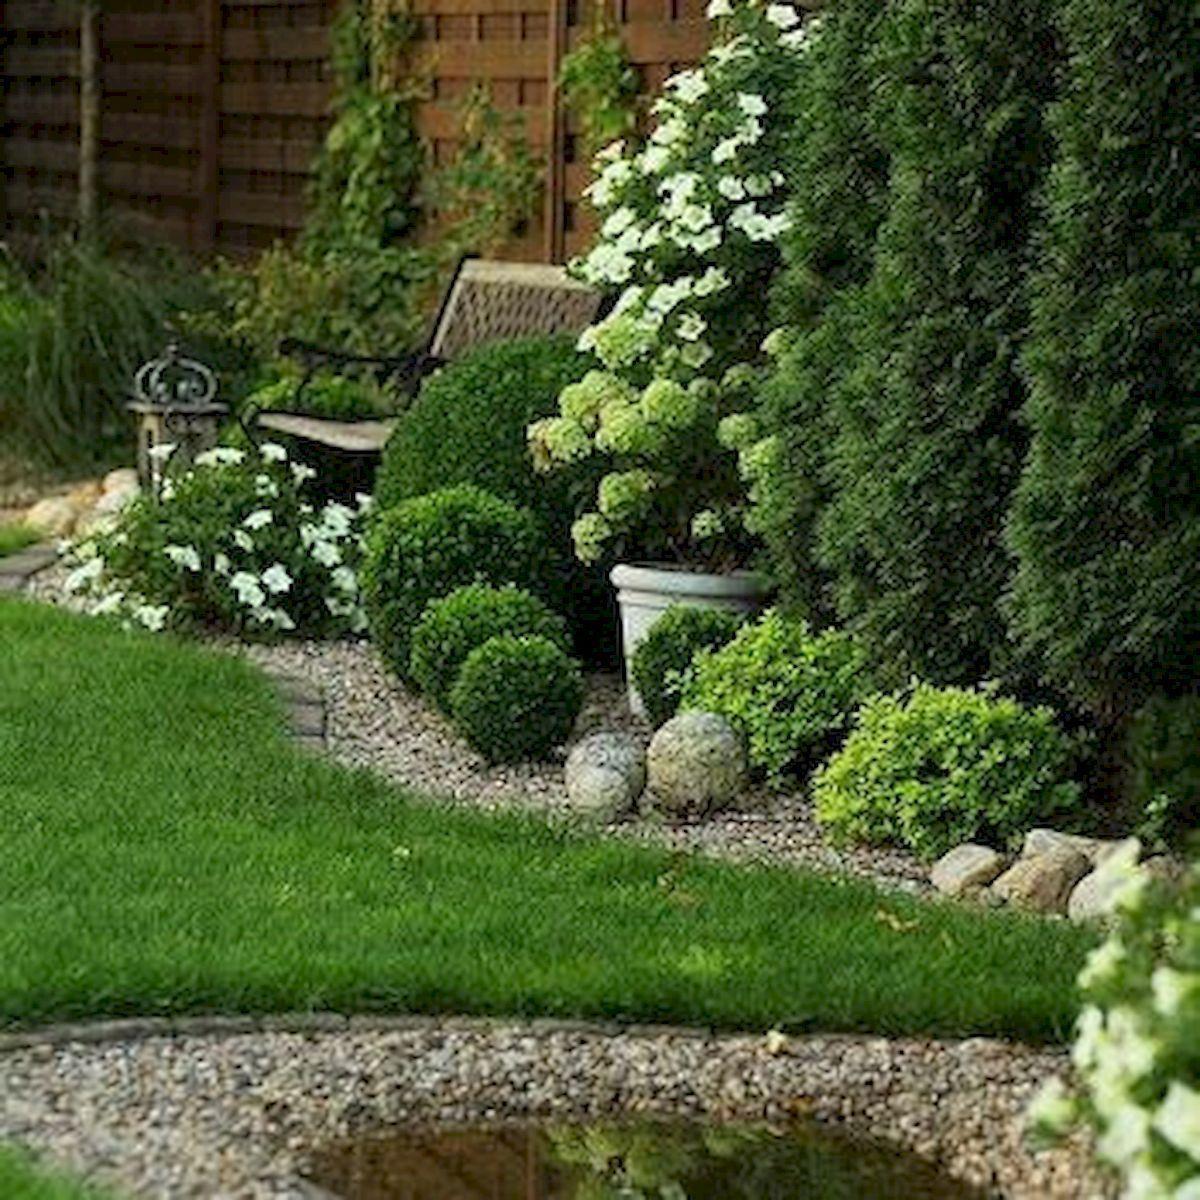 Beautiful Backyards Garden Ideas: 90 Beautiful Backyard Garden Design Ideas For Summer (79